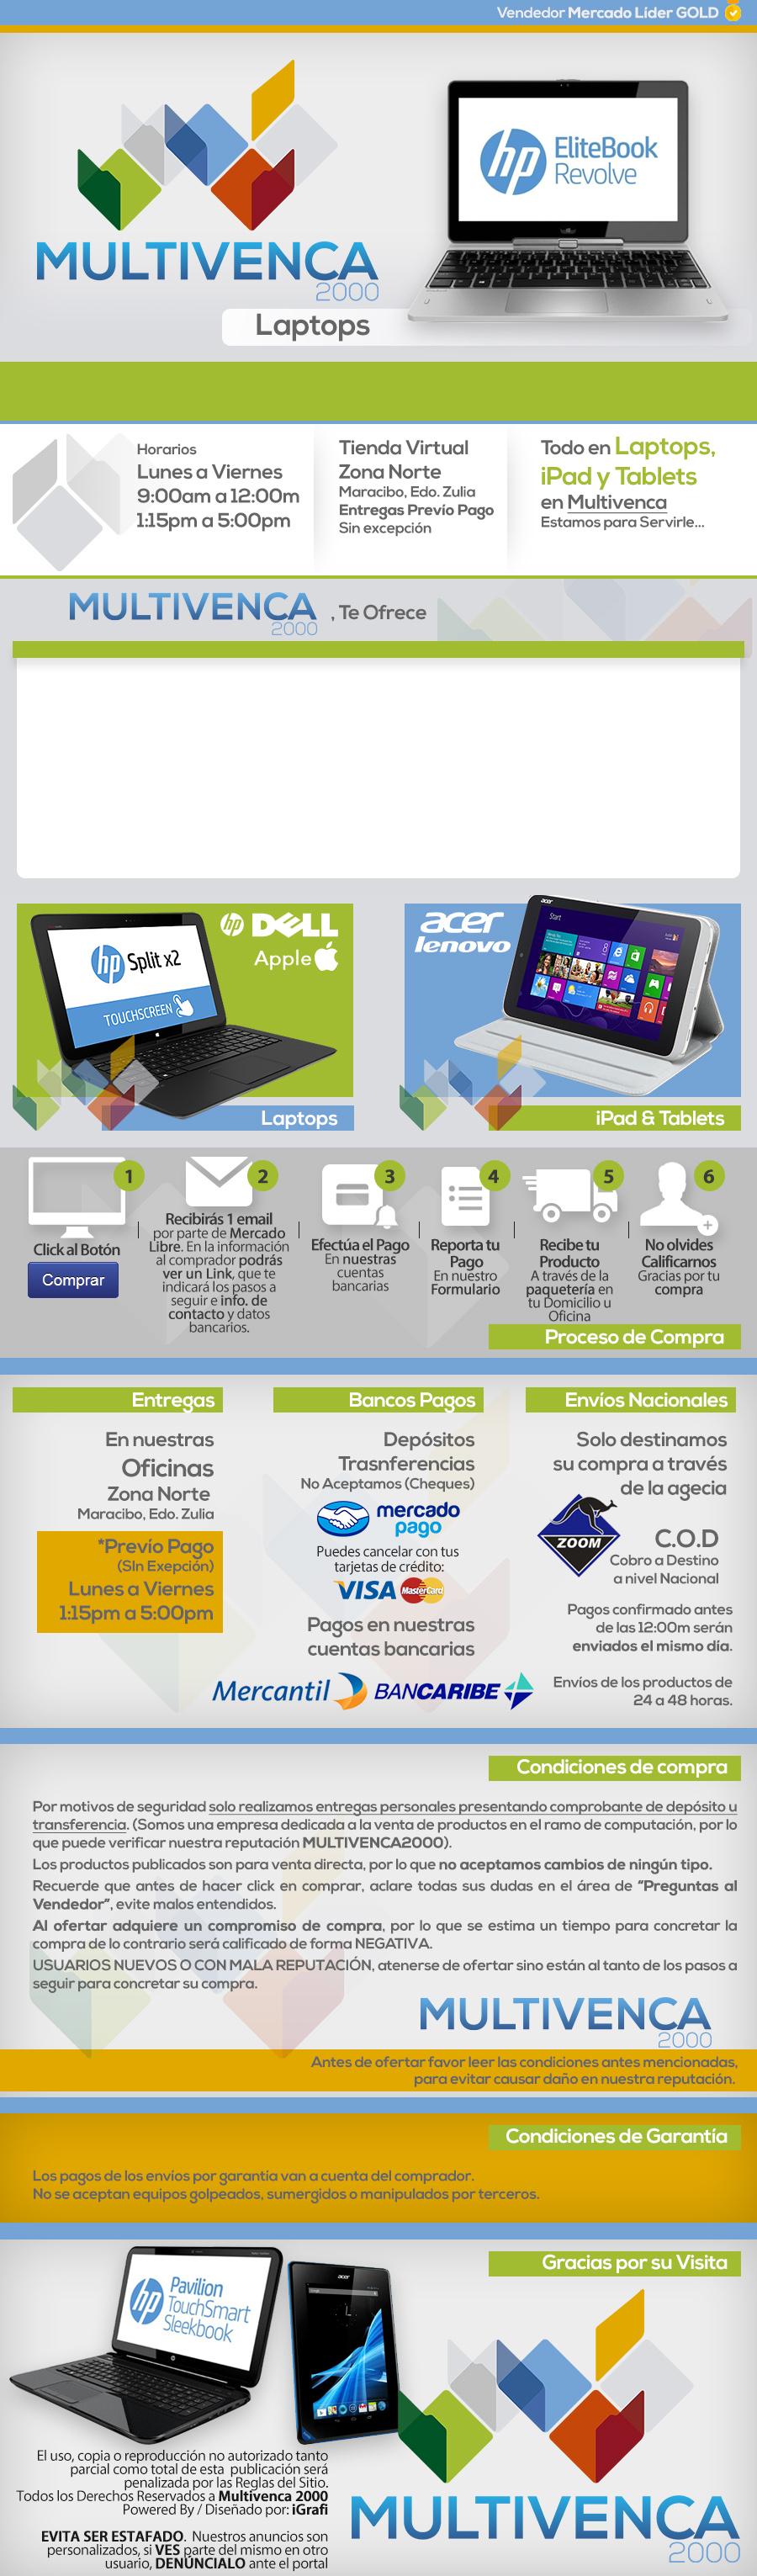 Cliente Multivenca 2000. Venta en equipos de computación, laptops ...